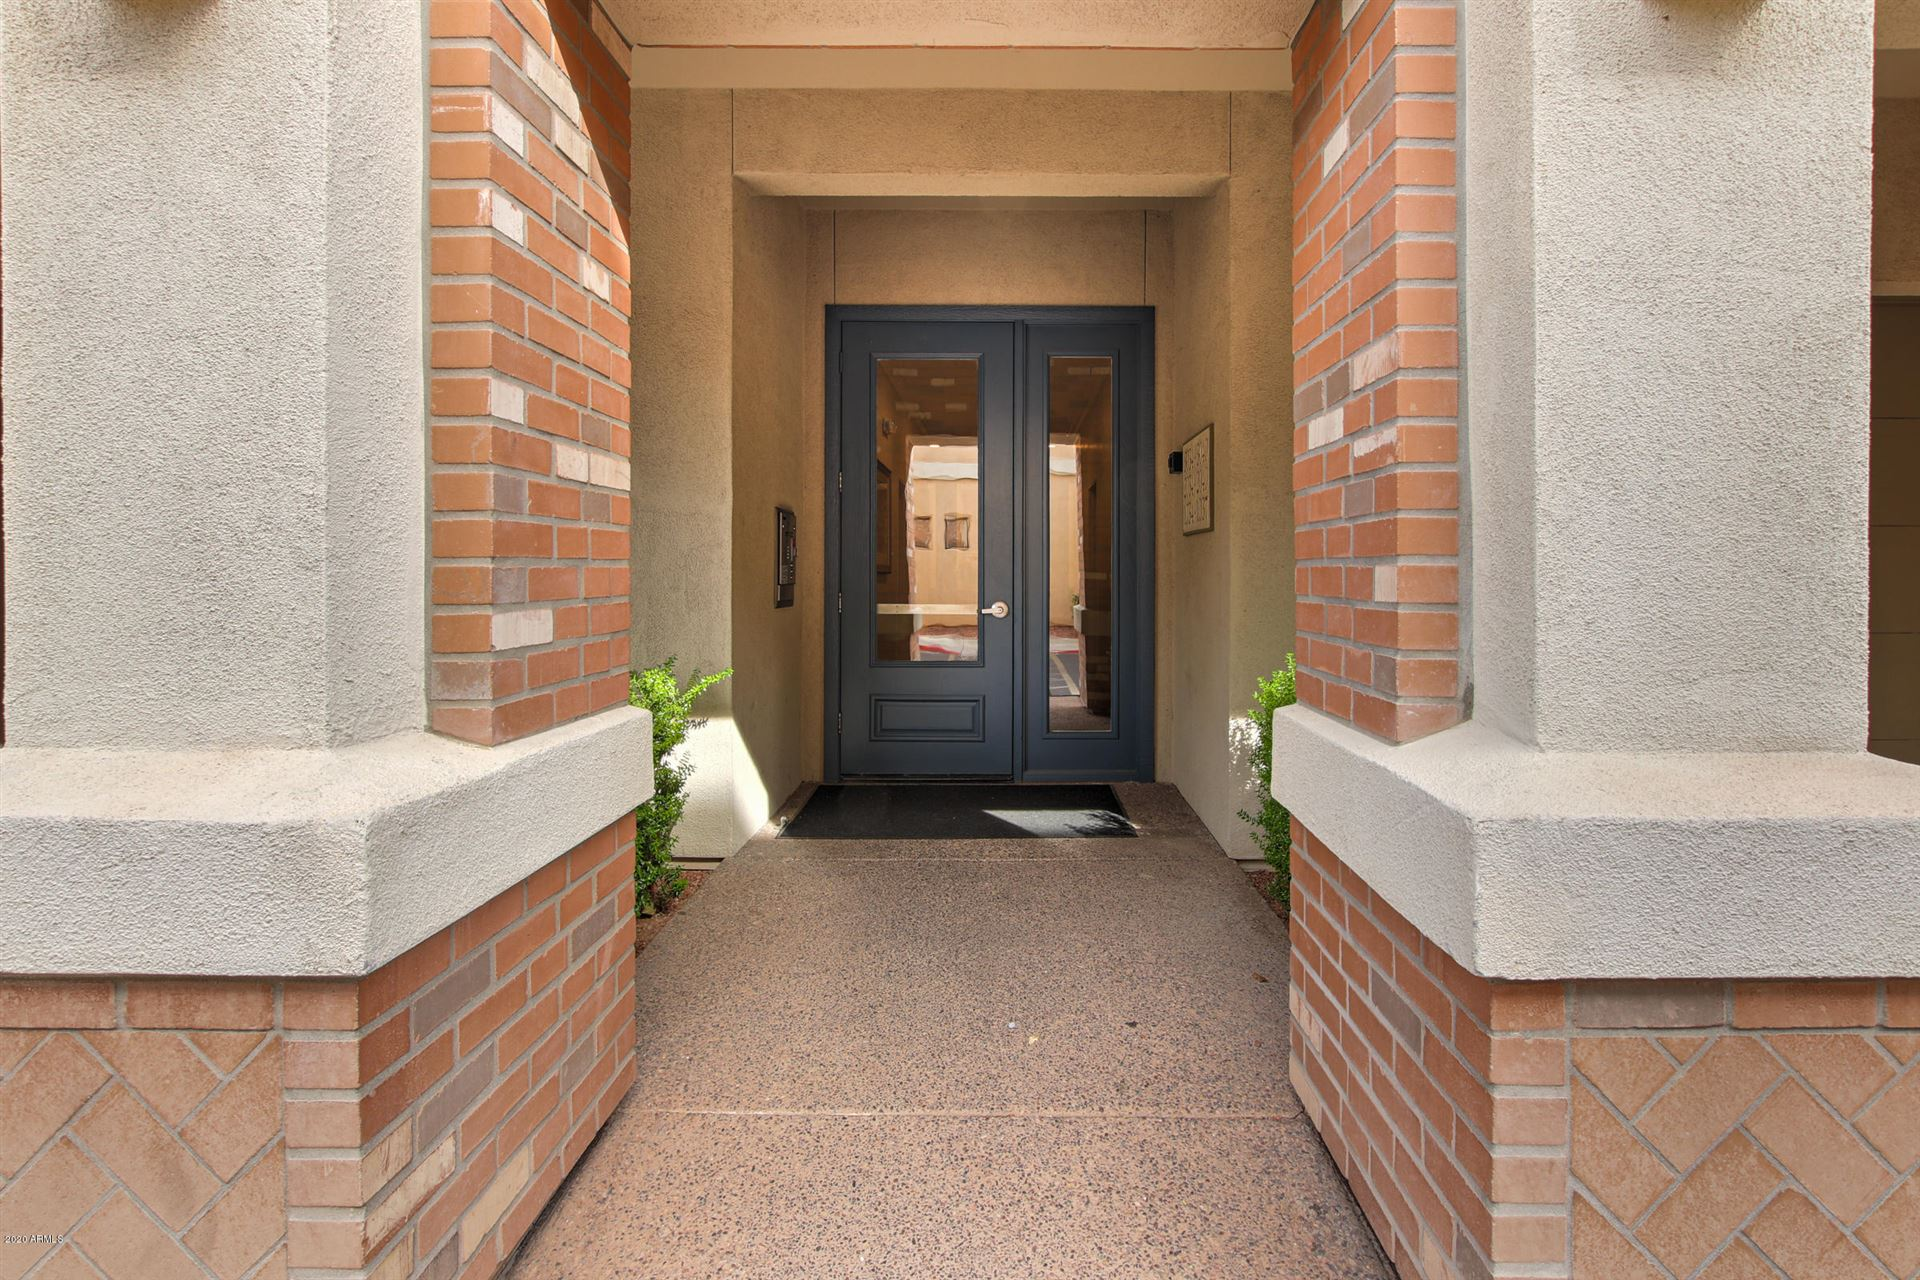 2989 N 44TH Street #3035, Phoenix, AZ 85018 - MLS#: 6158160